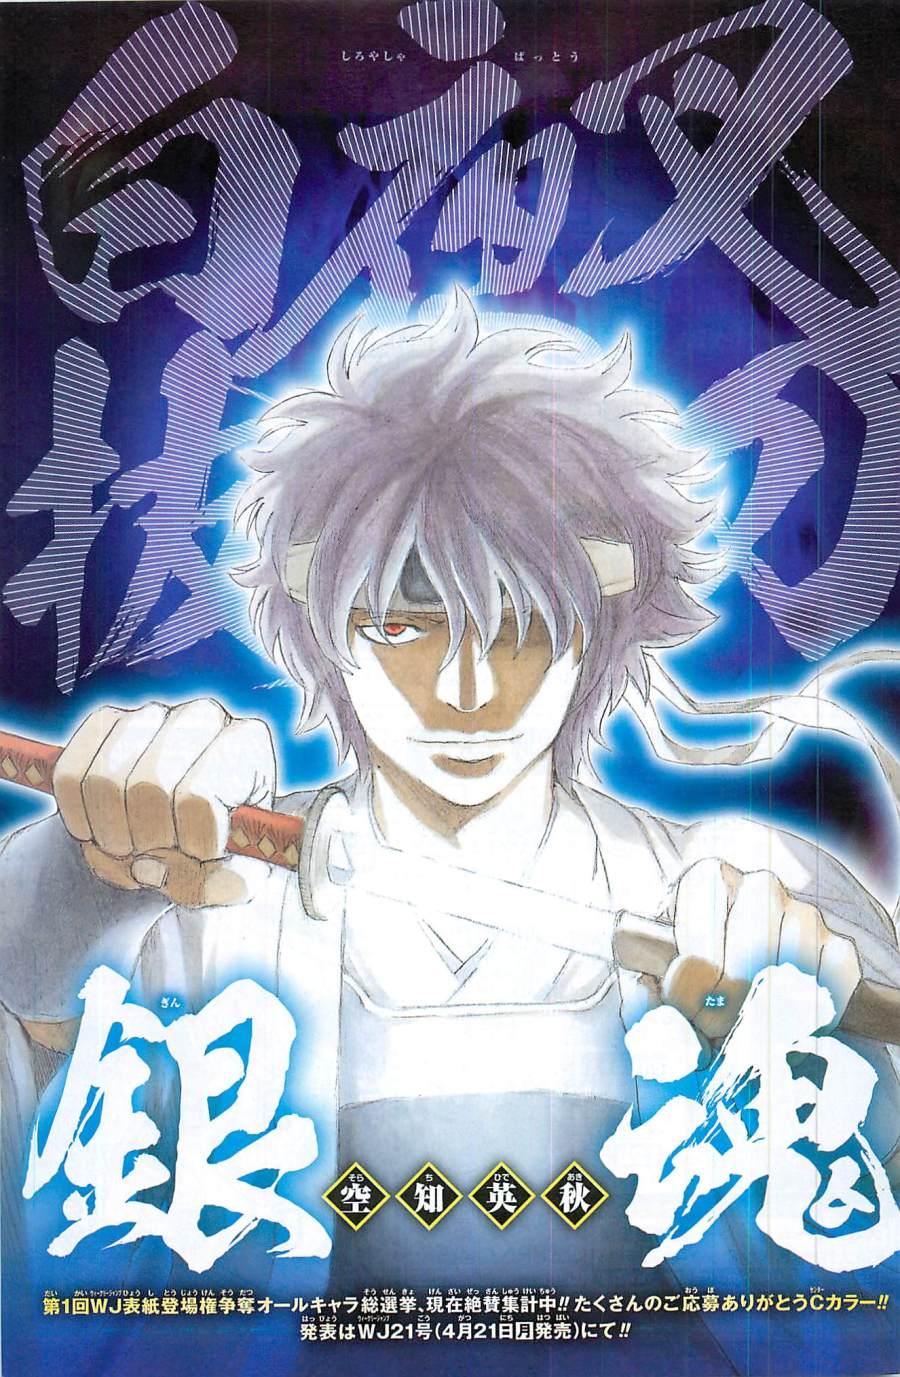 Gintama dans Weekly Shonen Jump 2014 #16